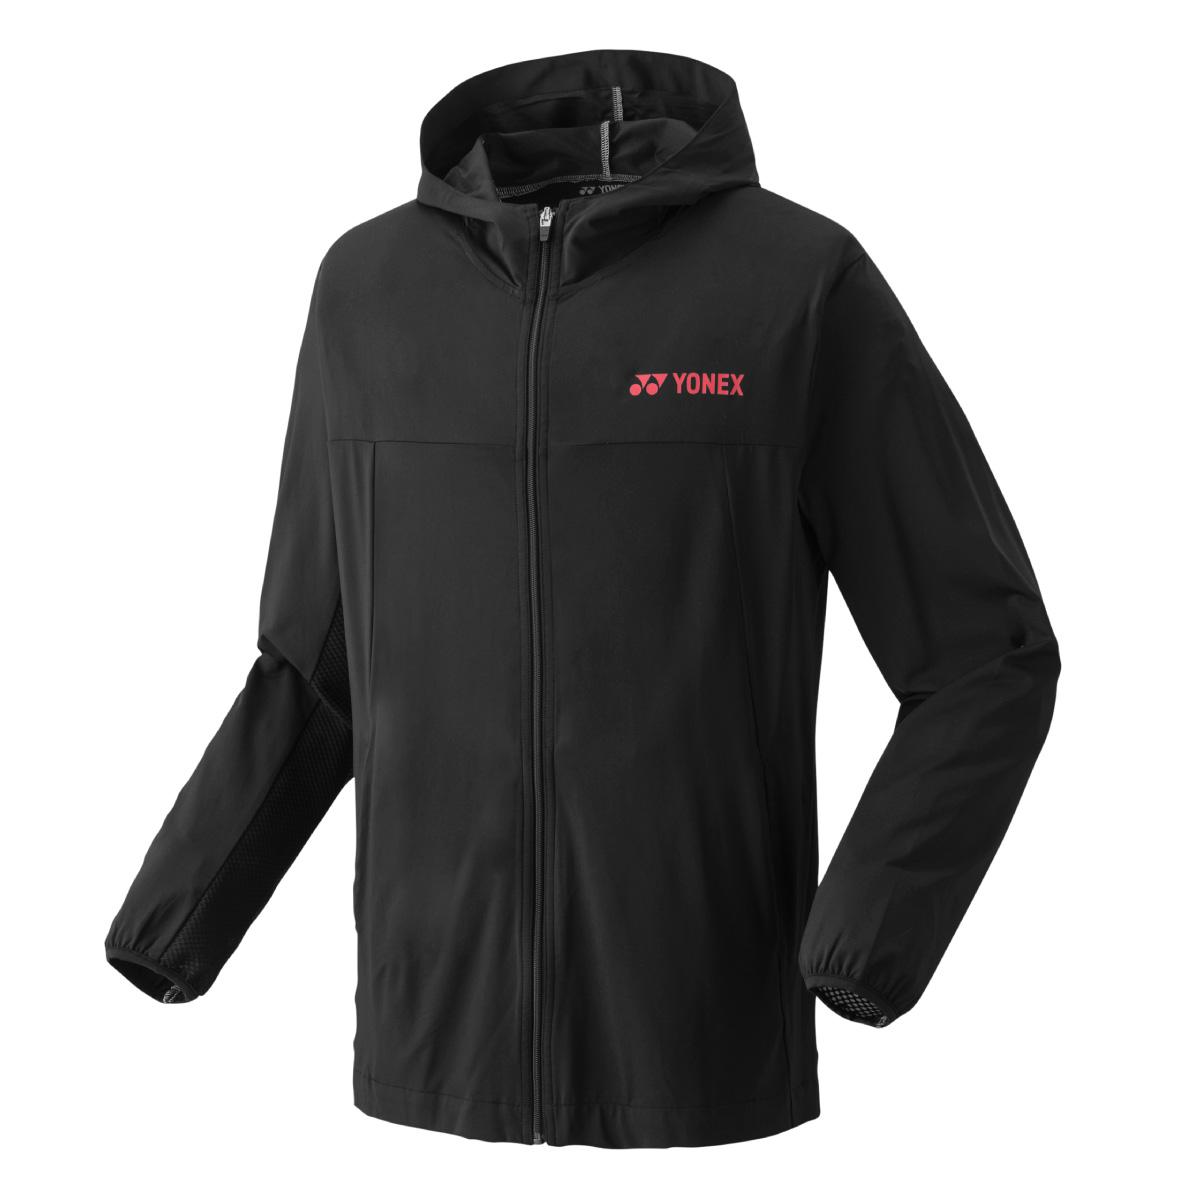 YONEX - Men's Warm-up Jacket, Practice #50086Detailbild - 0